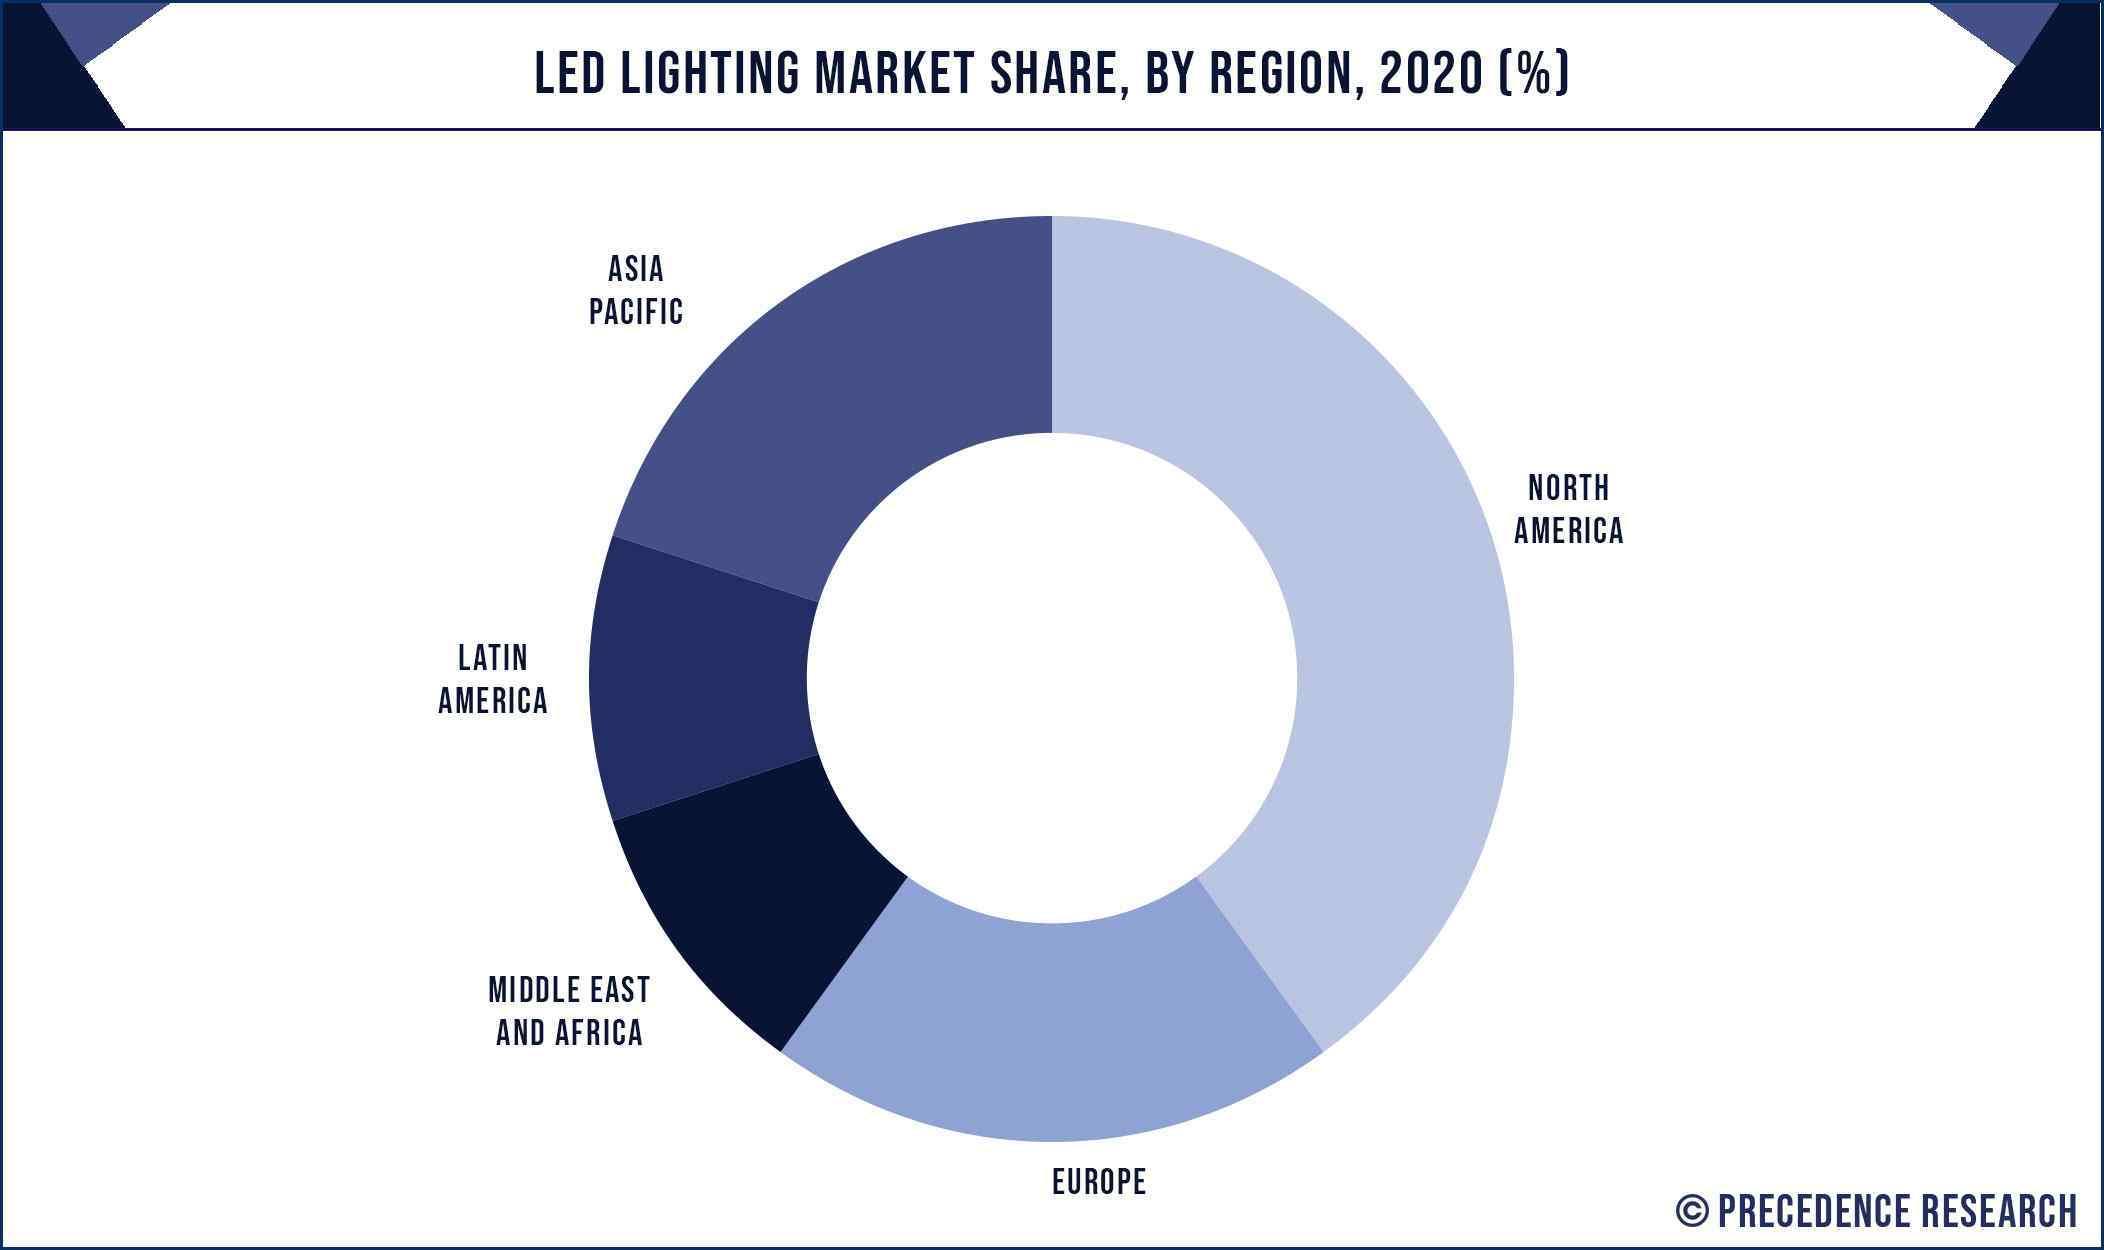 LED Lighting Market Share, By Region, 2020 (%)